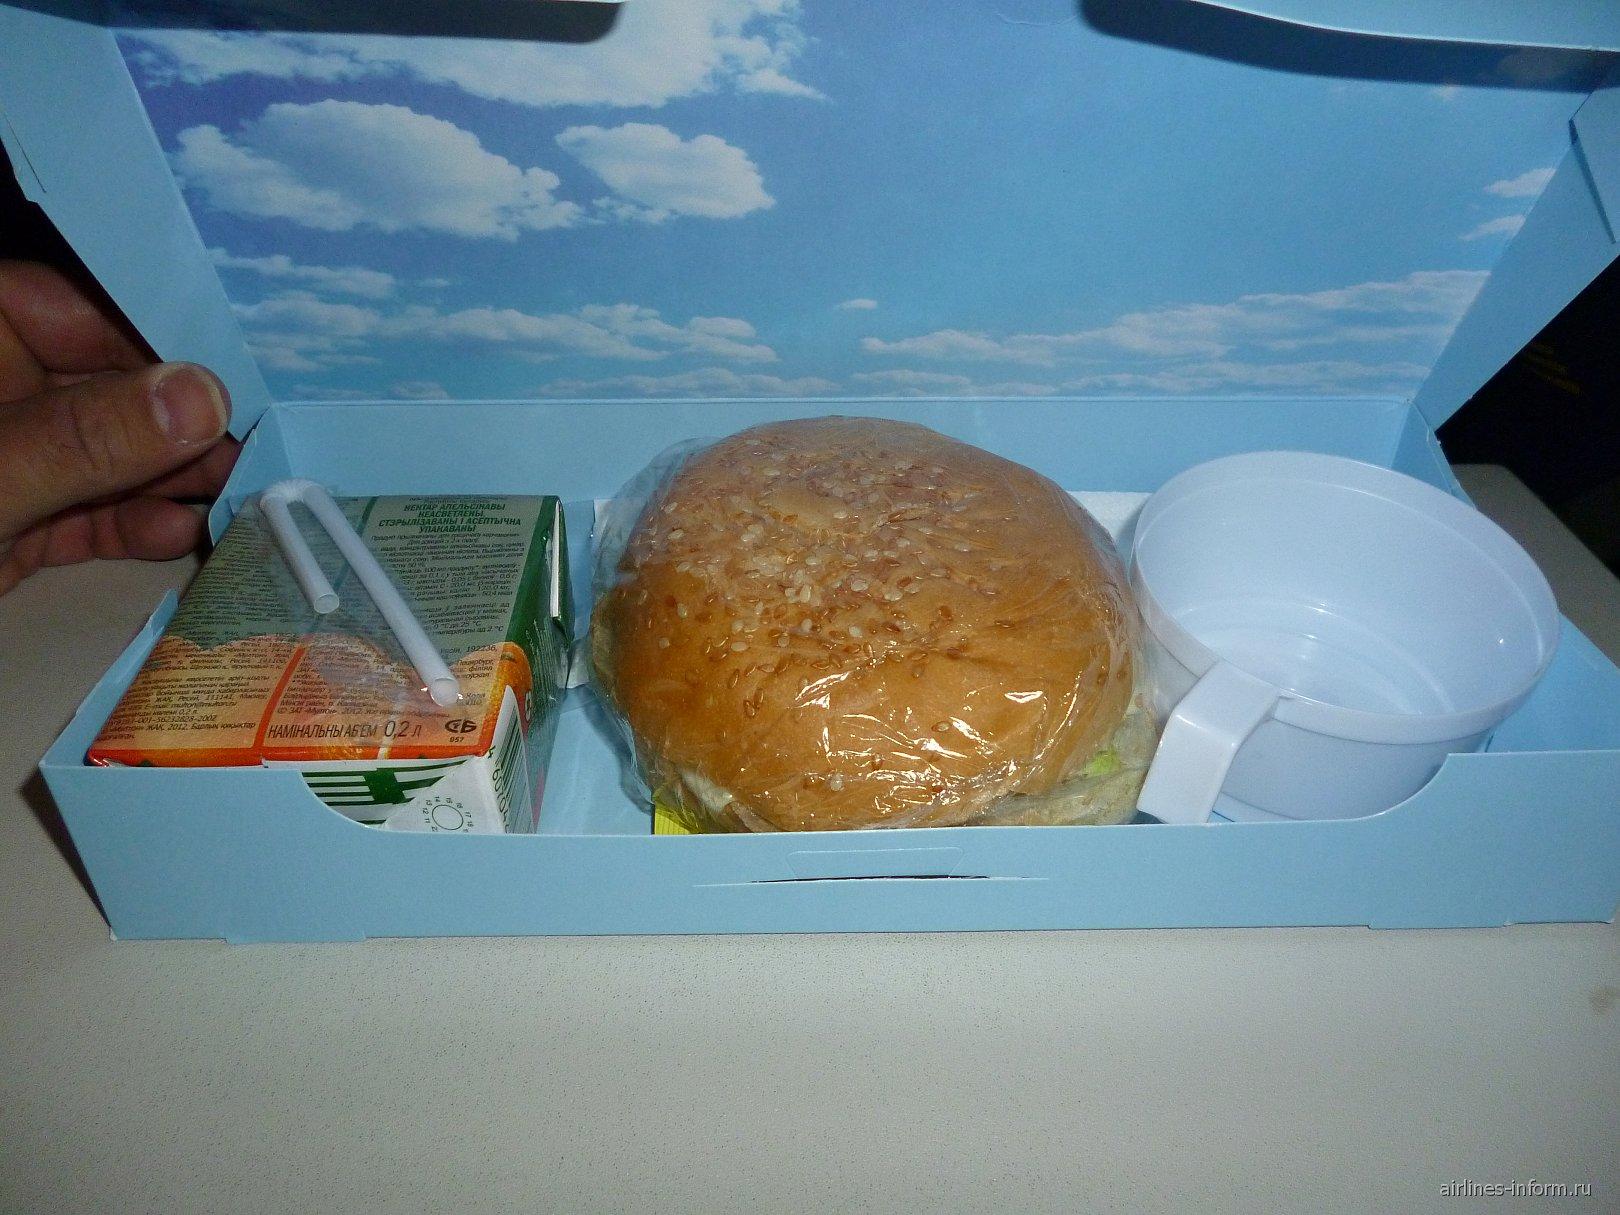 Питание на рейсе авиакомпании Владивосток Авиа Хабаровск-Владивосток